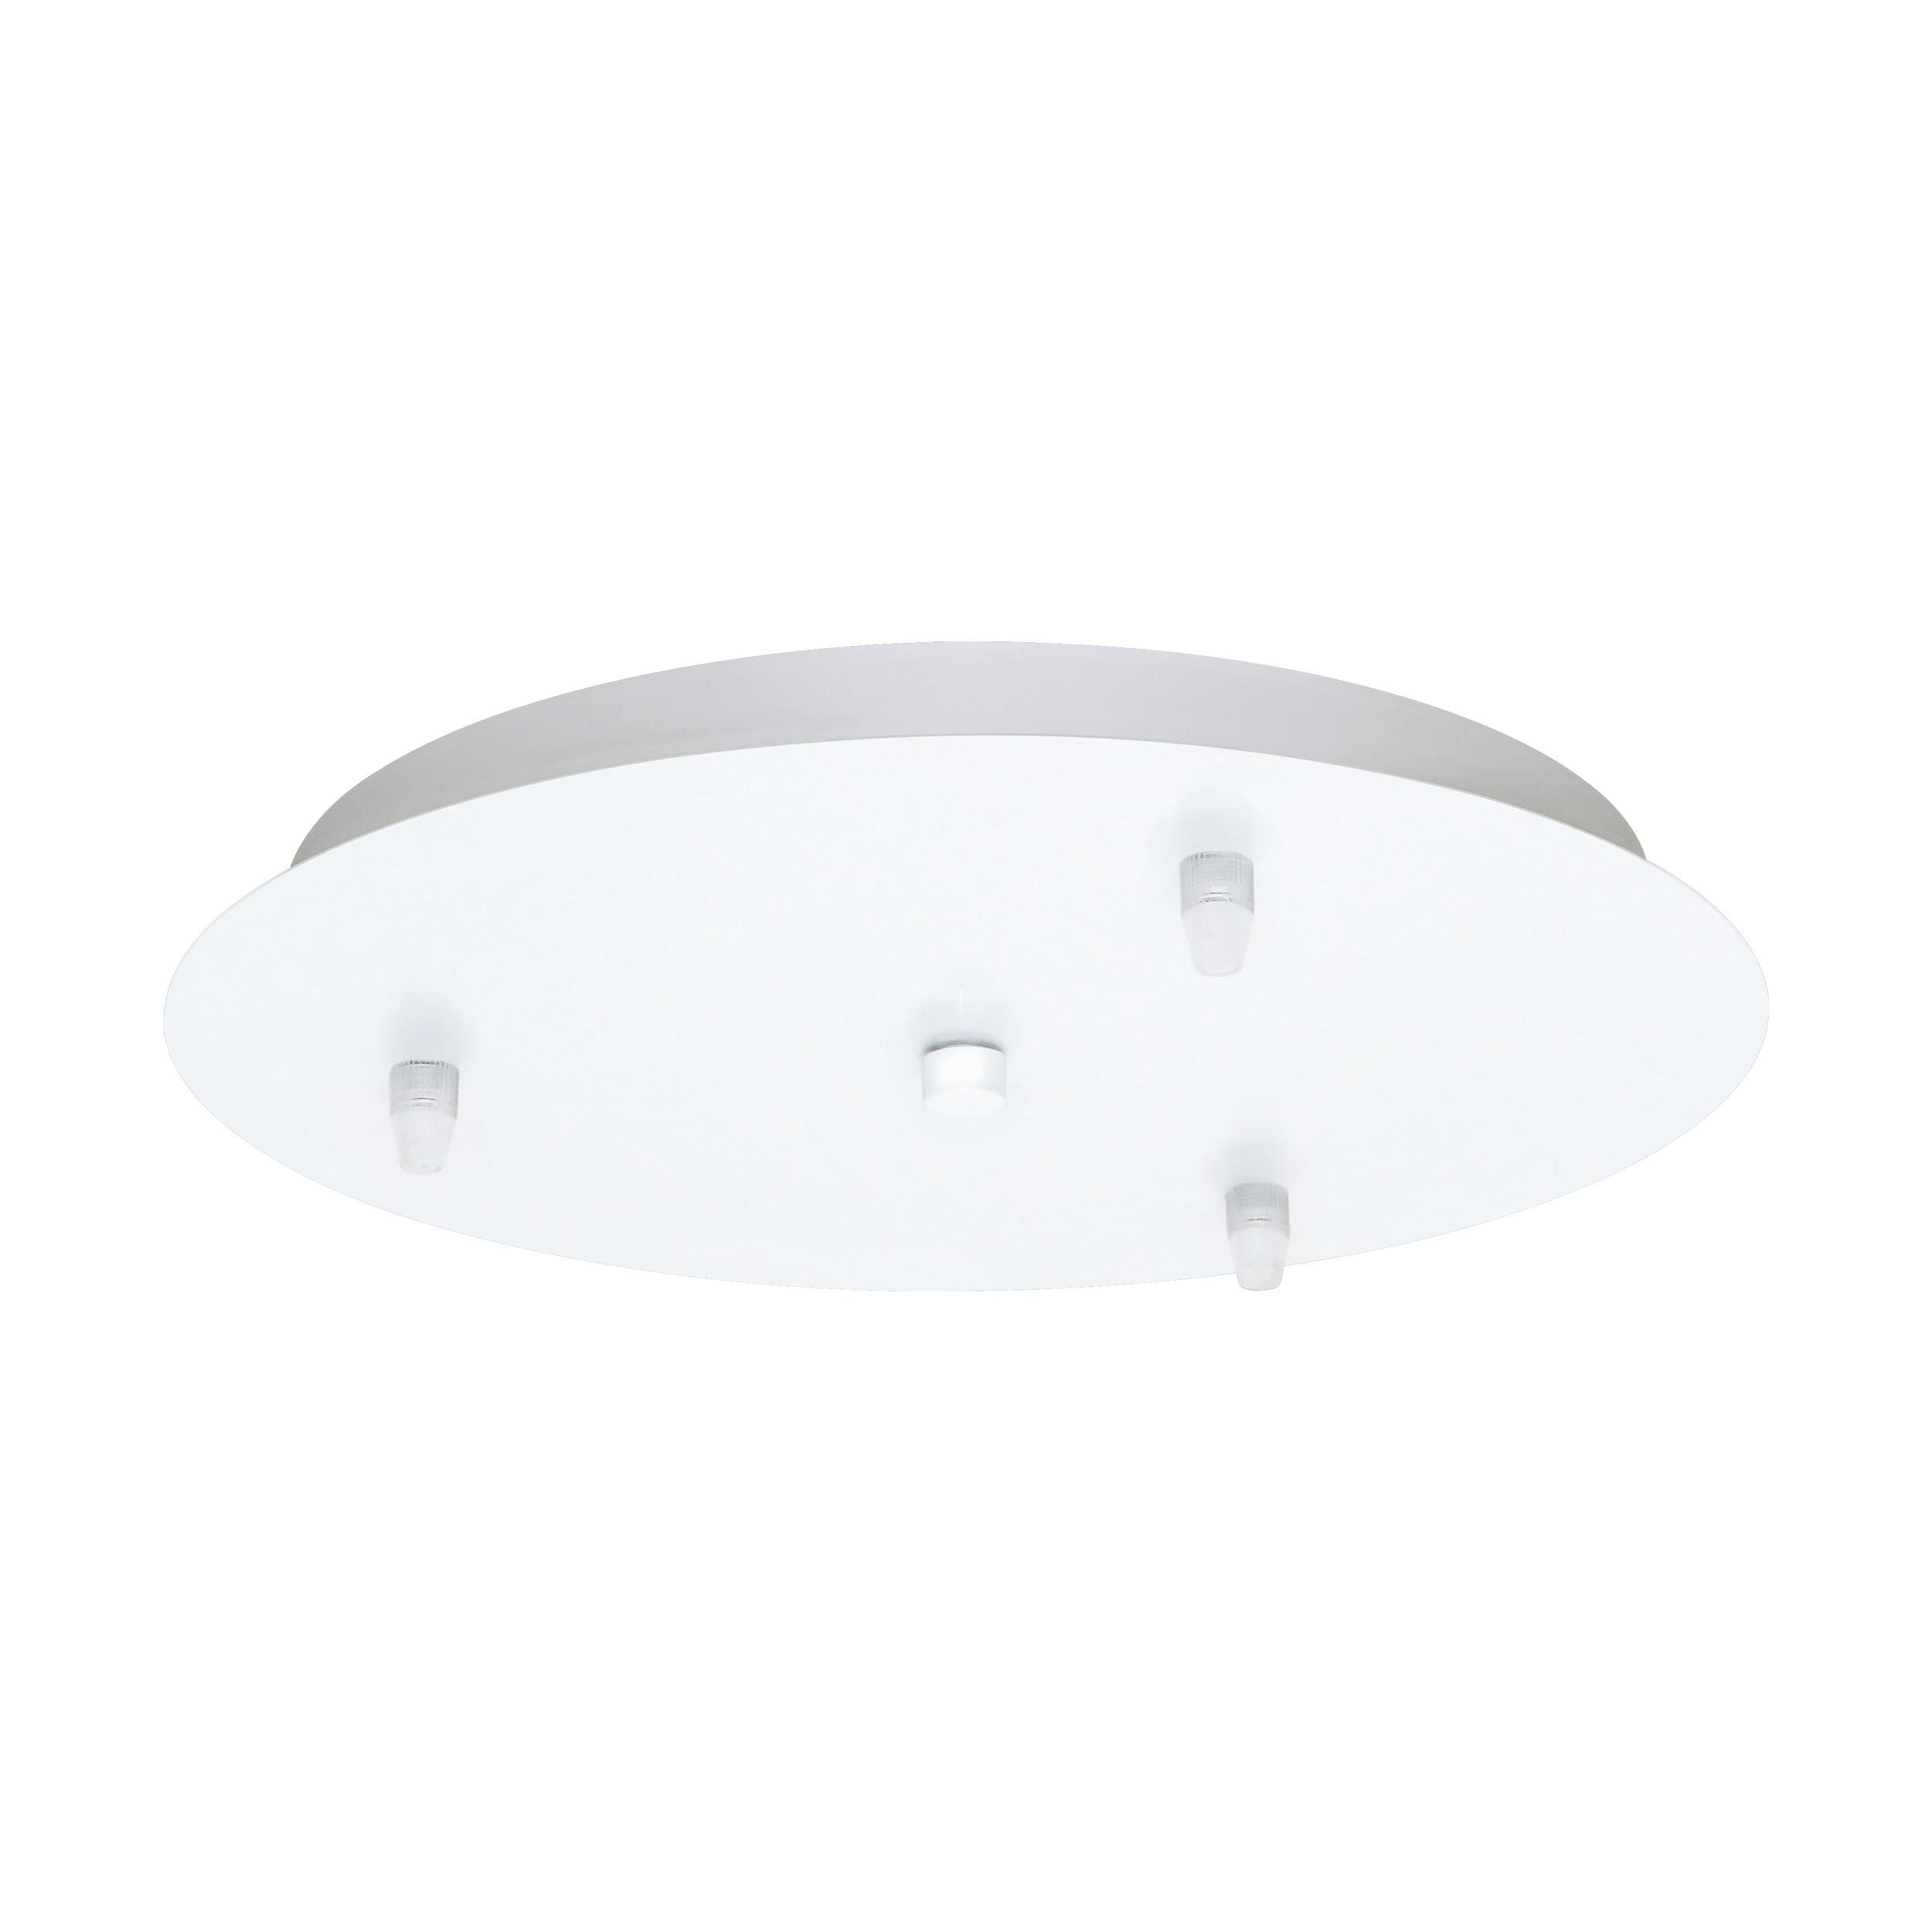 1 Stk Baldachin Pascoa 3 flammig weiß glänzend IP20 LI62315---